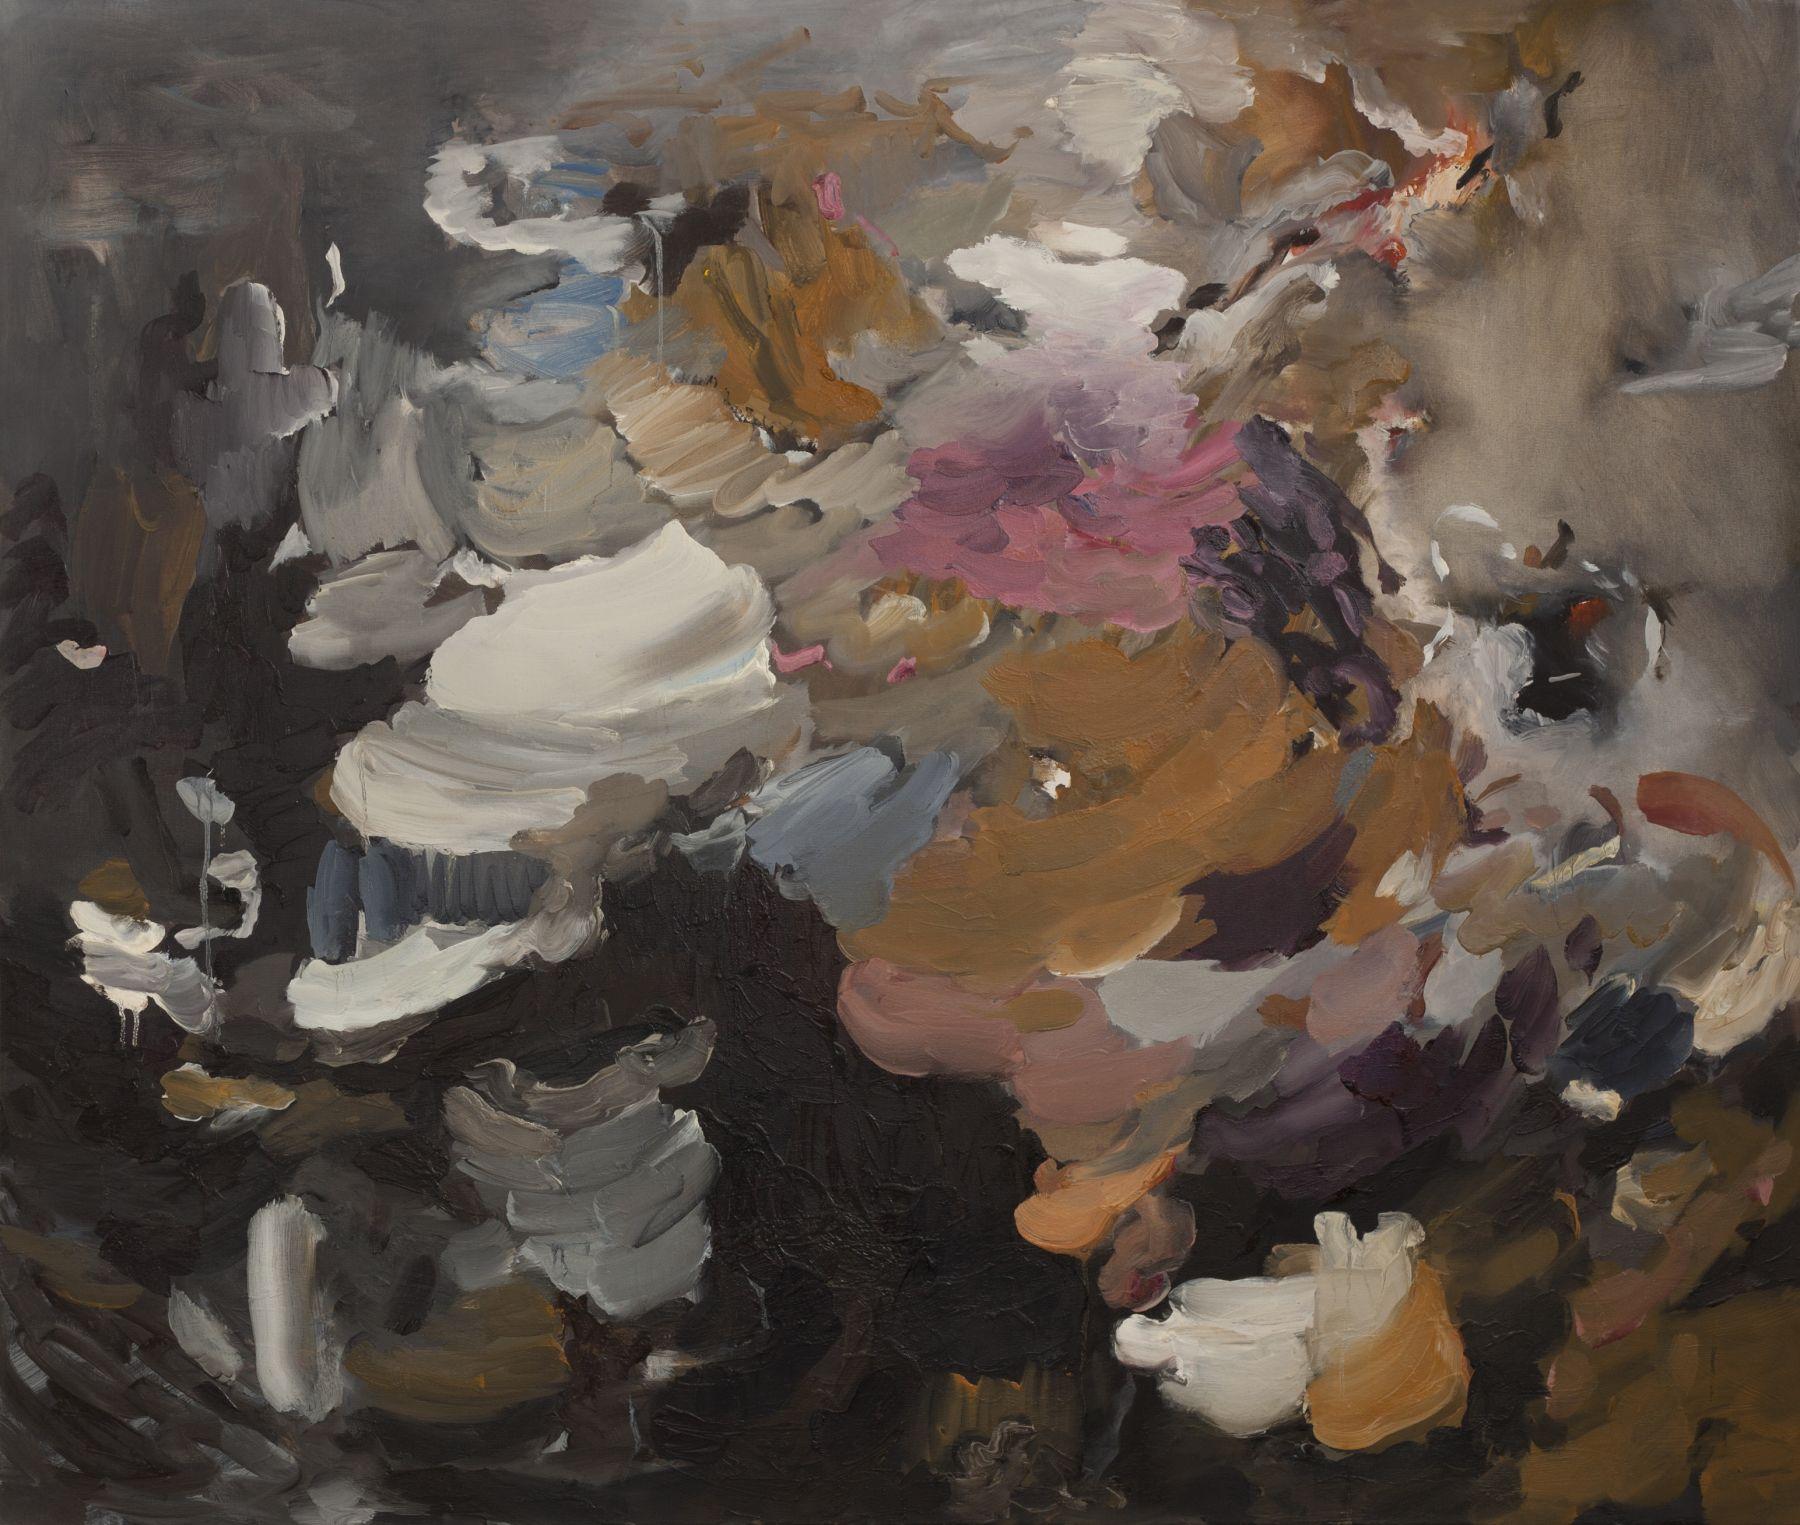 Jenny Carlsson